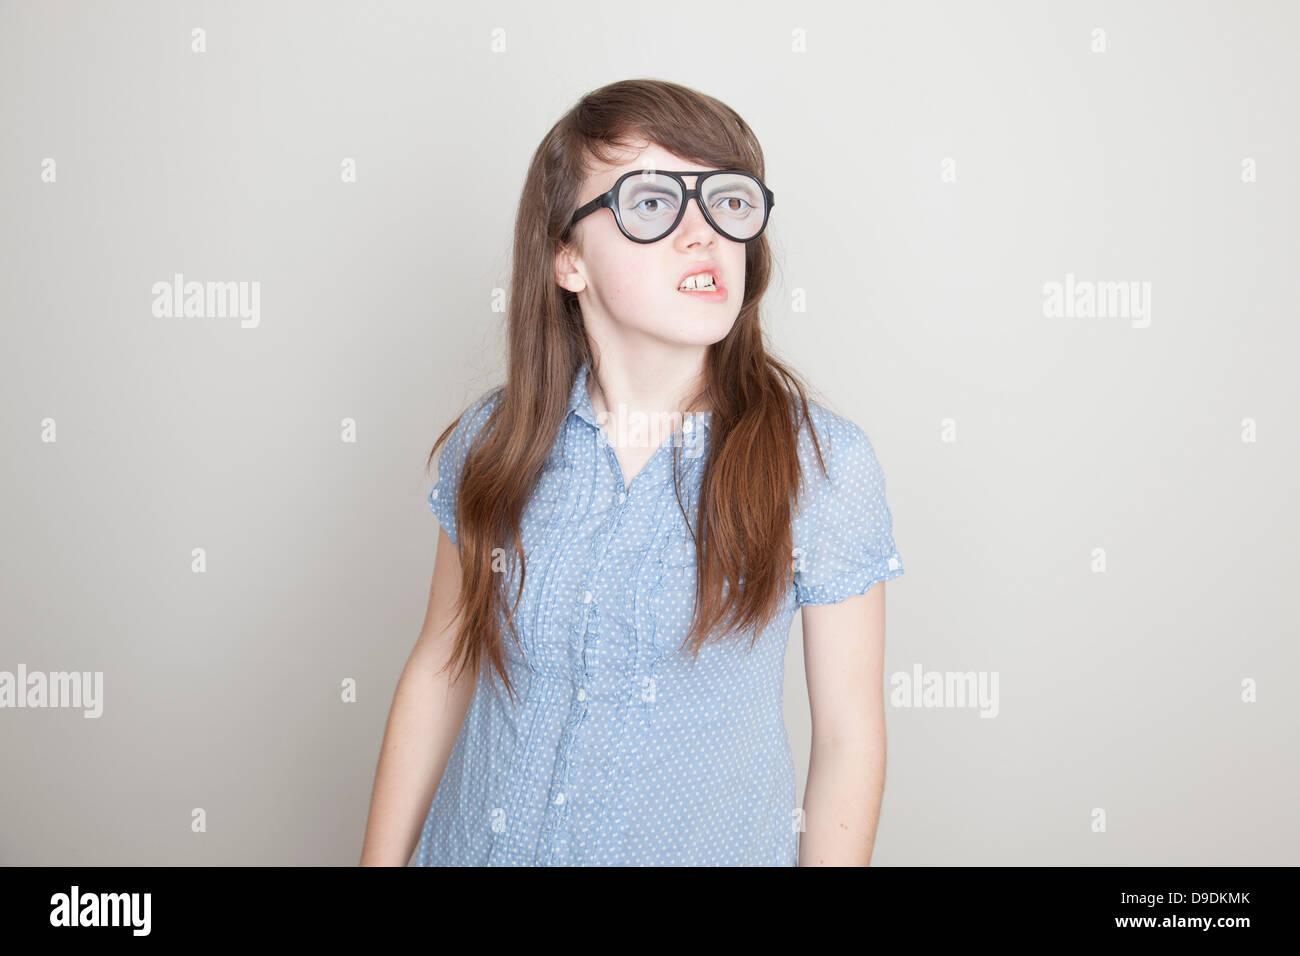 Girl wearing fake glasses grimacing Stock Photo